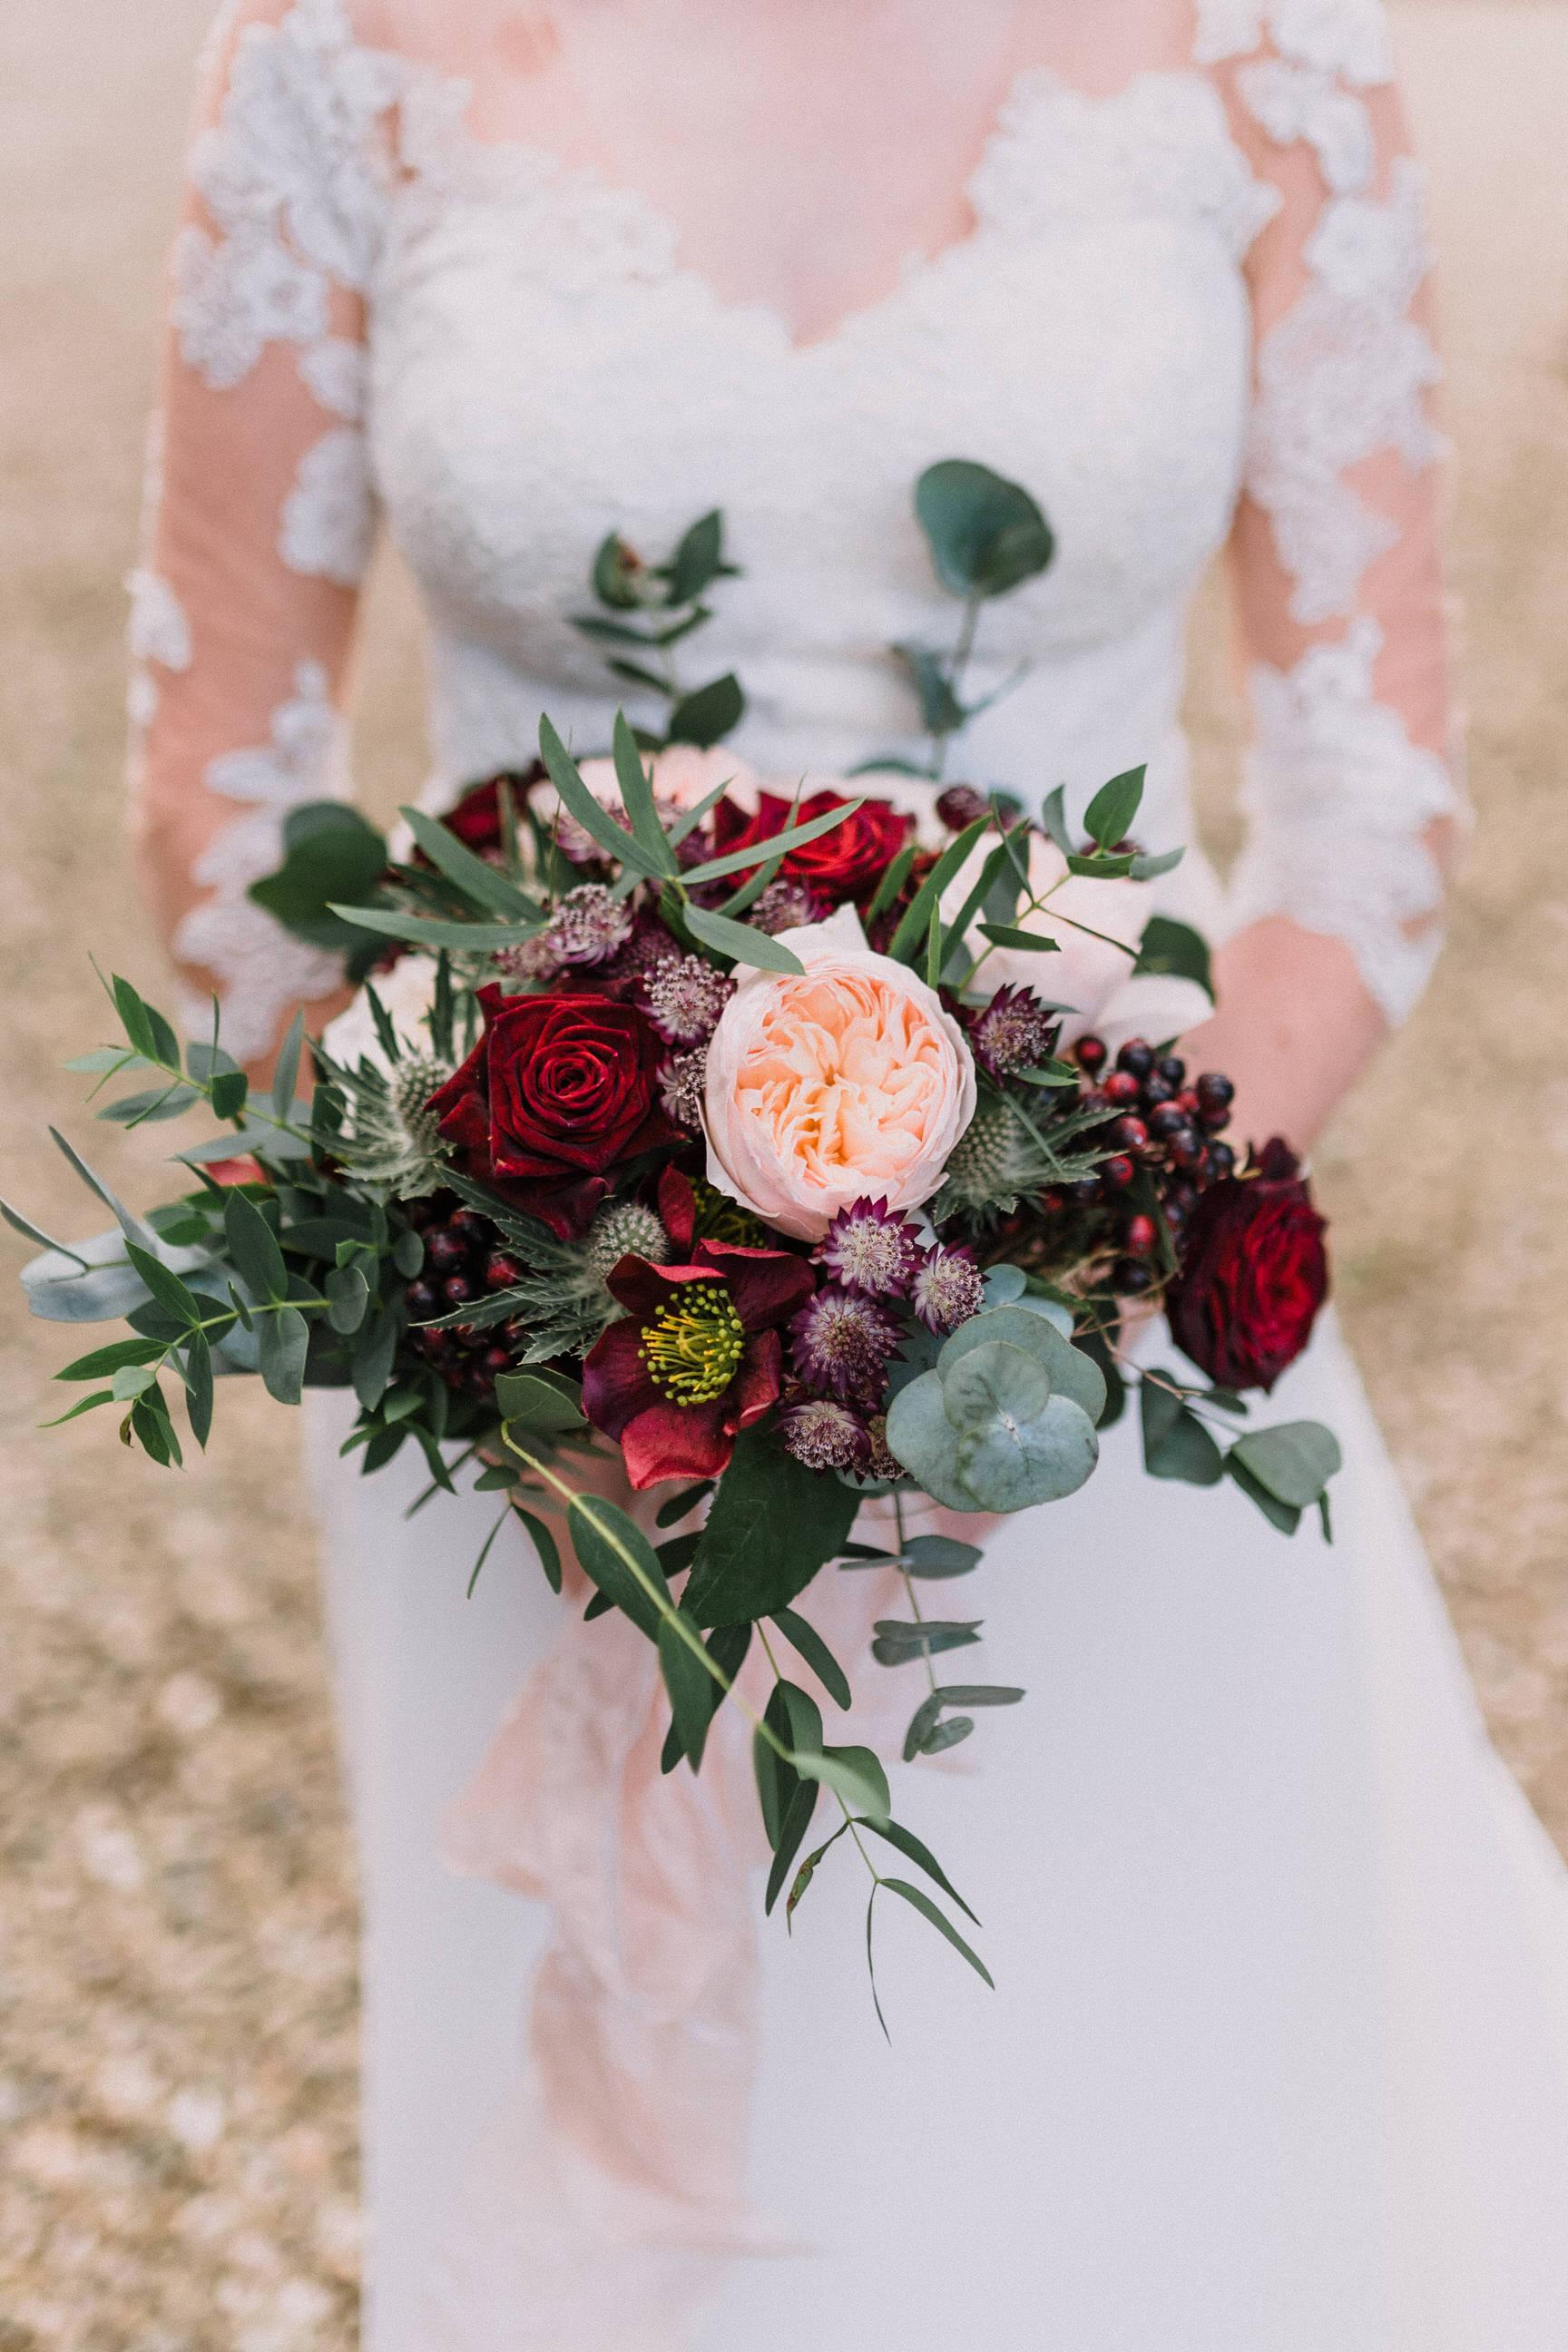 lissanoure castle wedding, northern ireland wedding photographer, romantic northern irish wedding venue, castle wedding ireland, natural wedding photography ni (90).jpg